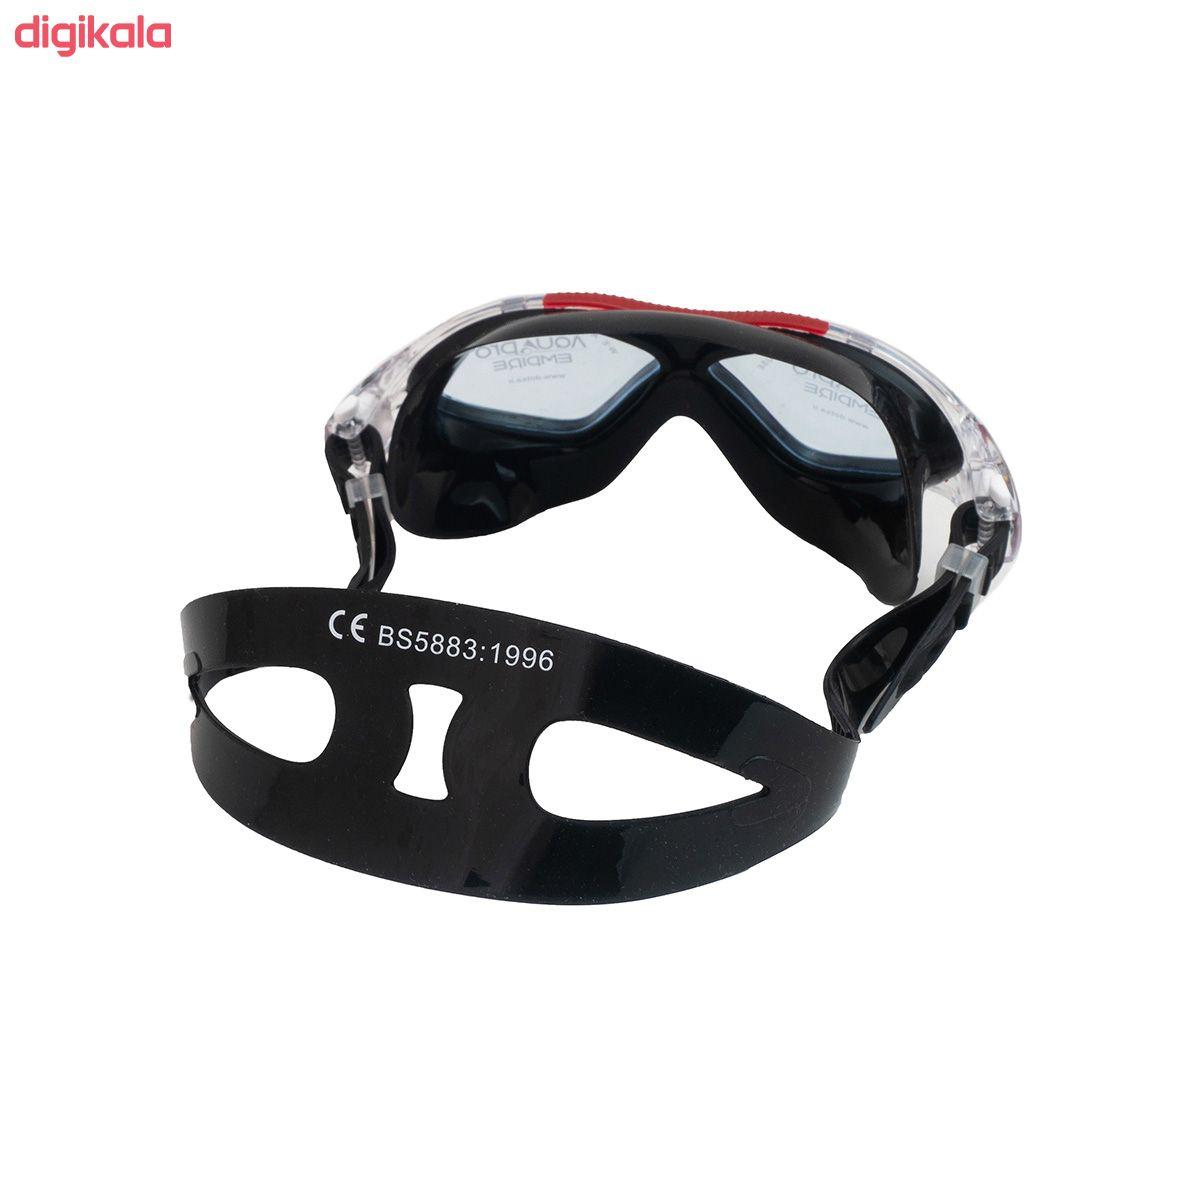 عینک شنا اکوا پرو مدل X7 main 1 9